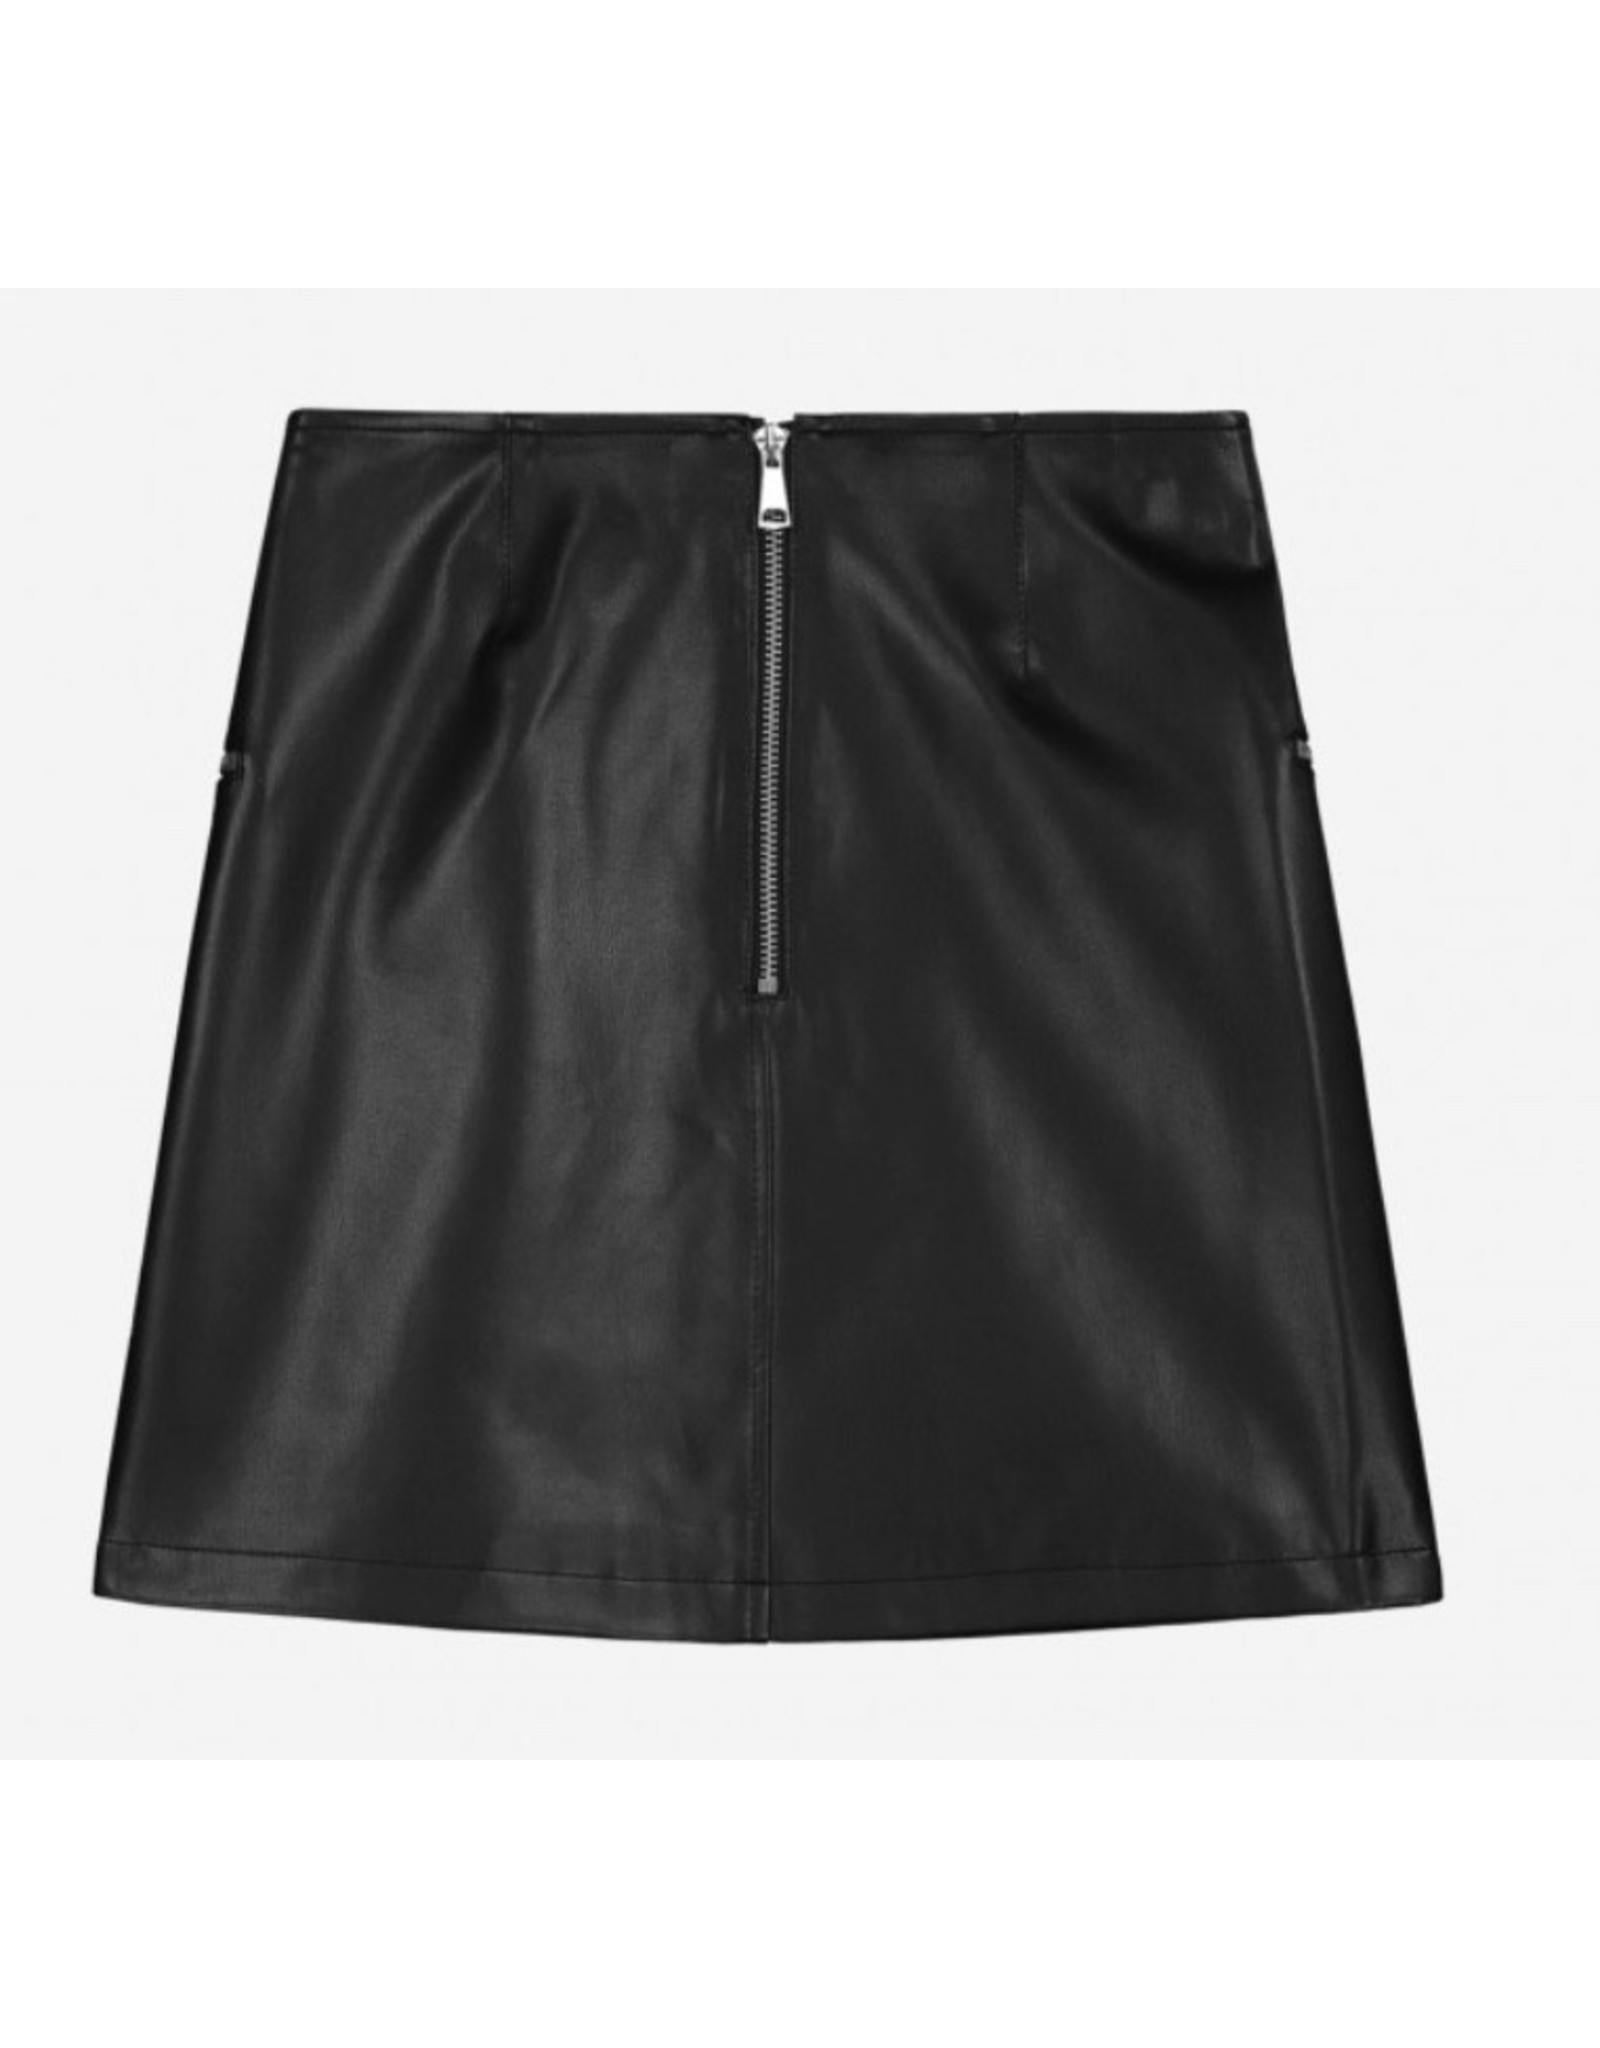 Nik & Nik CiCi Skirt